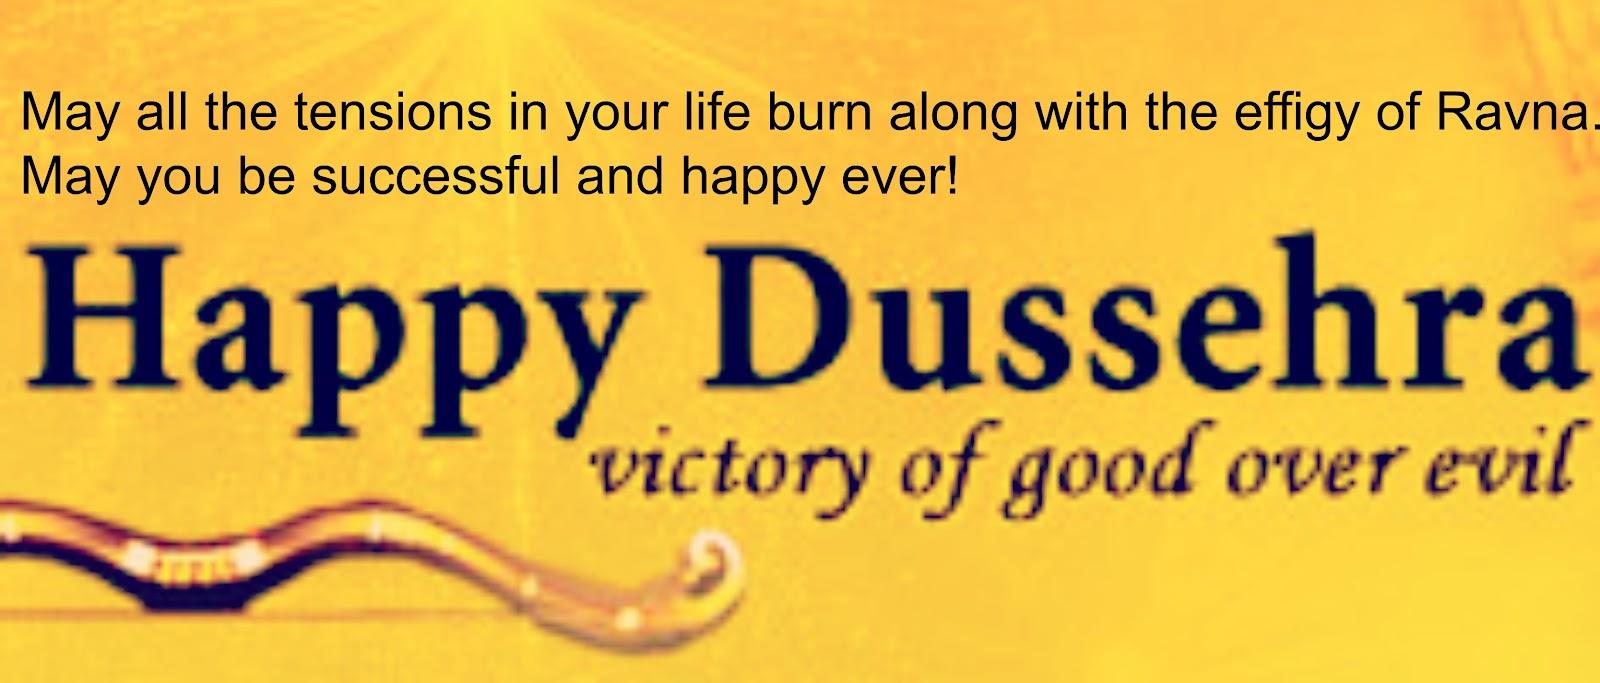 Happy dussehra greetings 2017 best vijayadashmi greeting cards happy2bdussehra2bgreetings2b20162b 2bbest2bvijayadashmi2bgreeting m4hsunfo